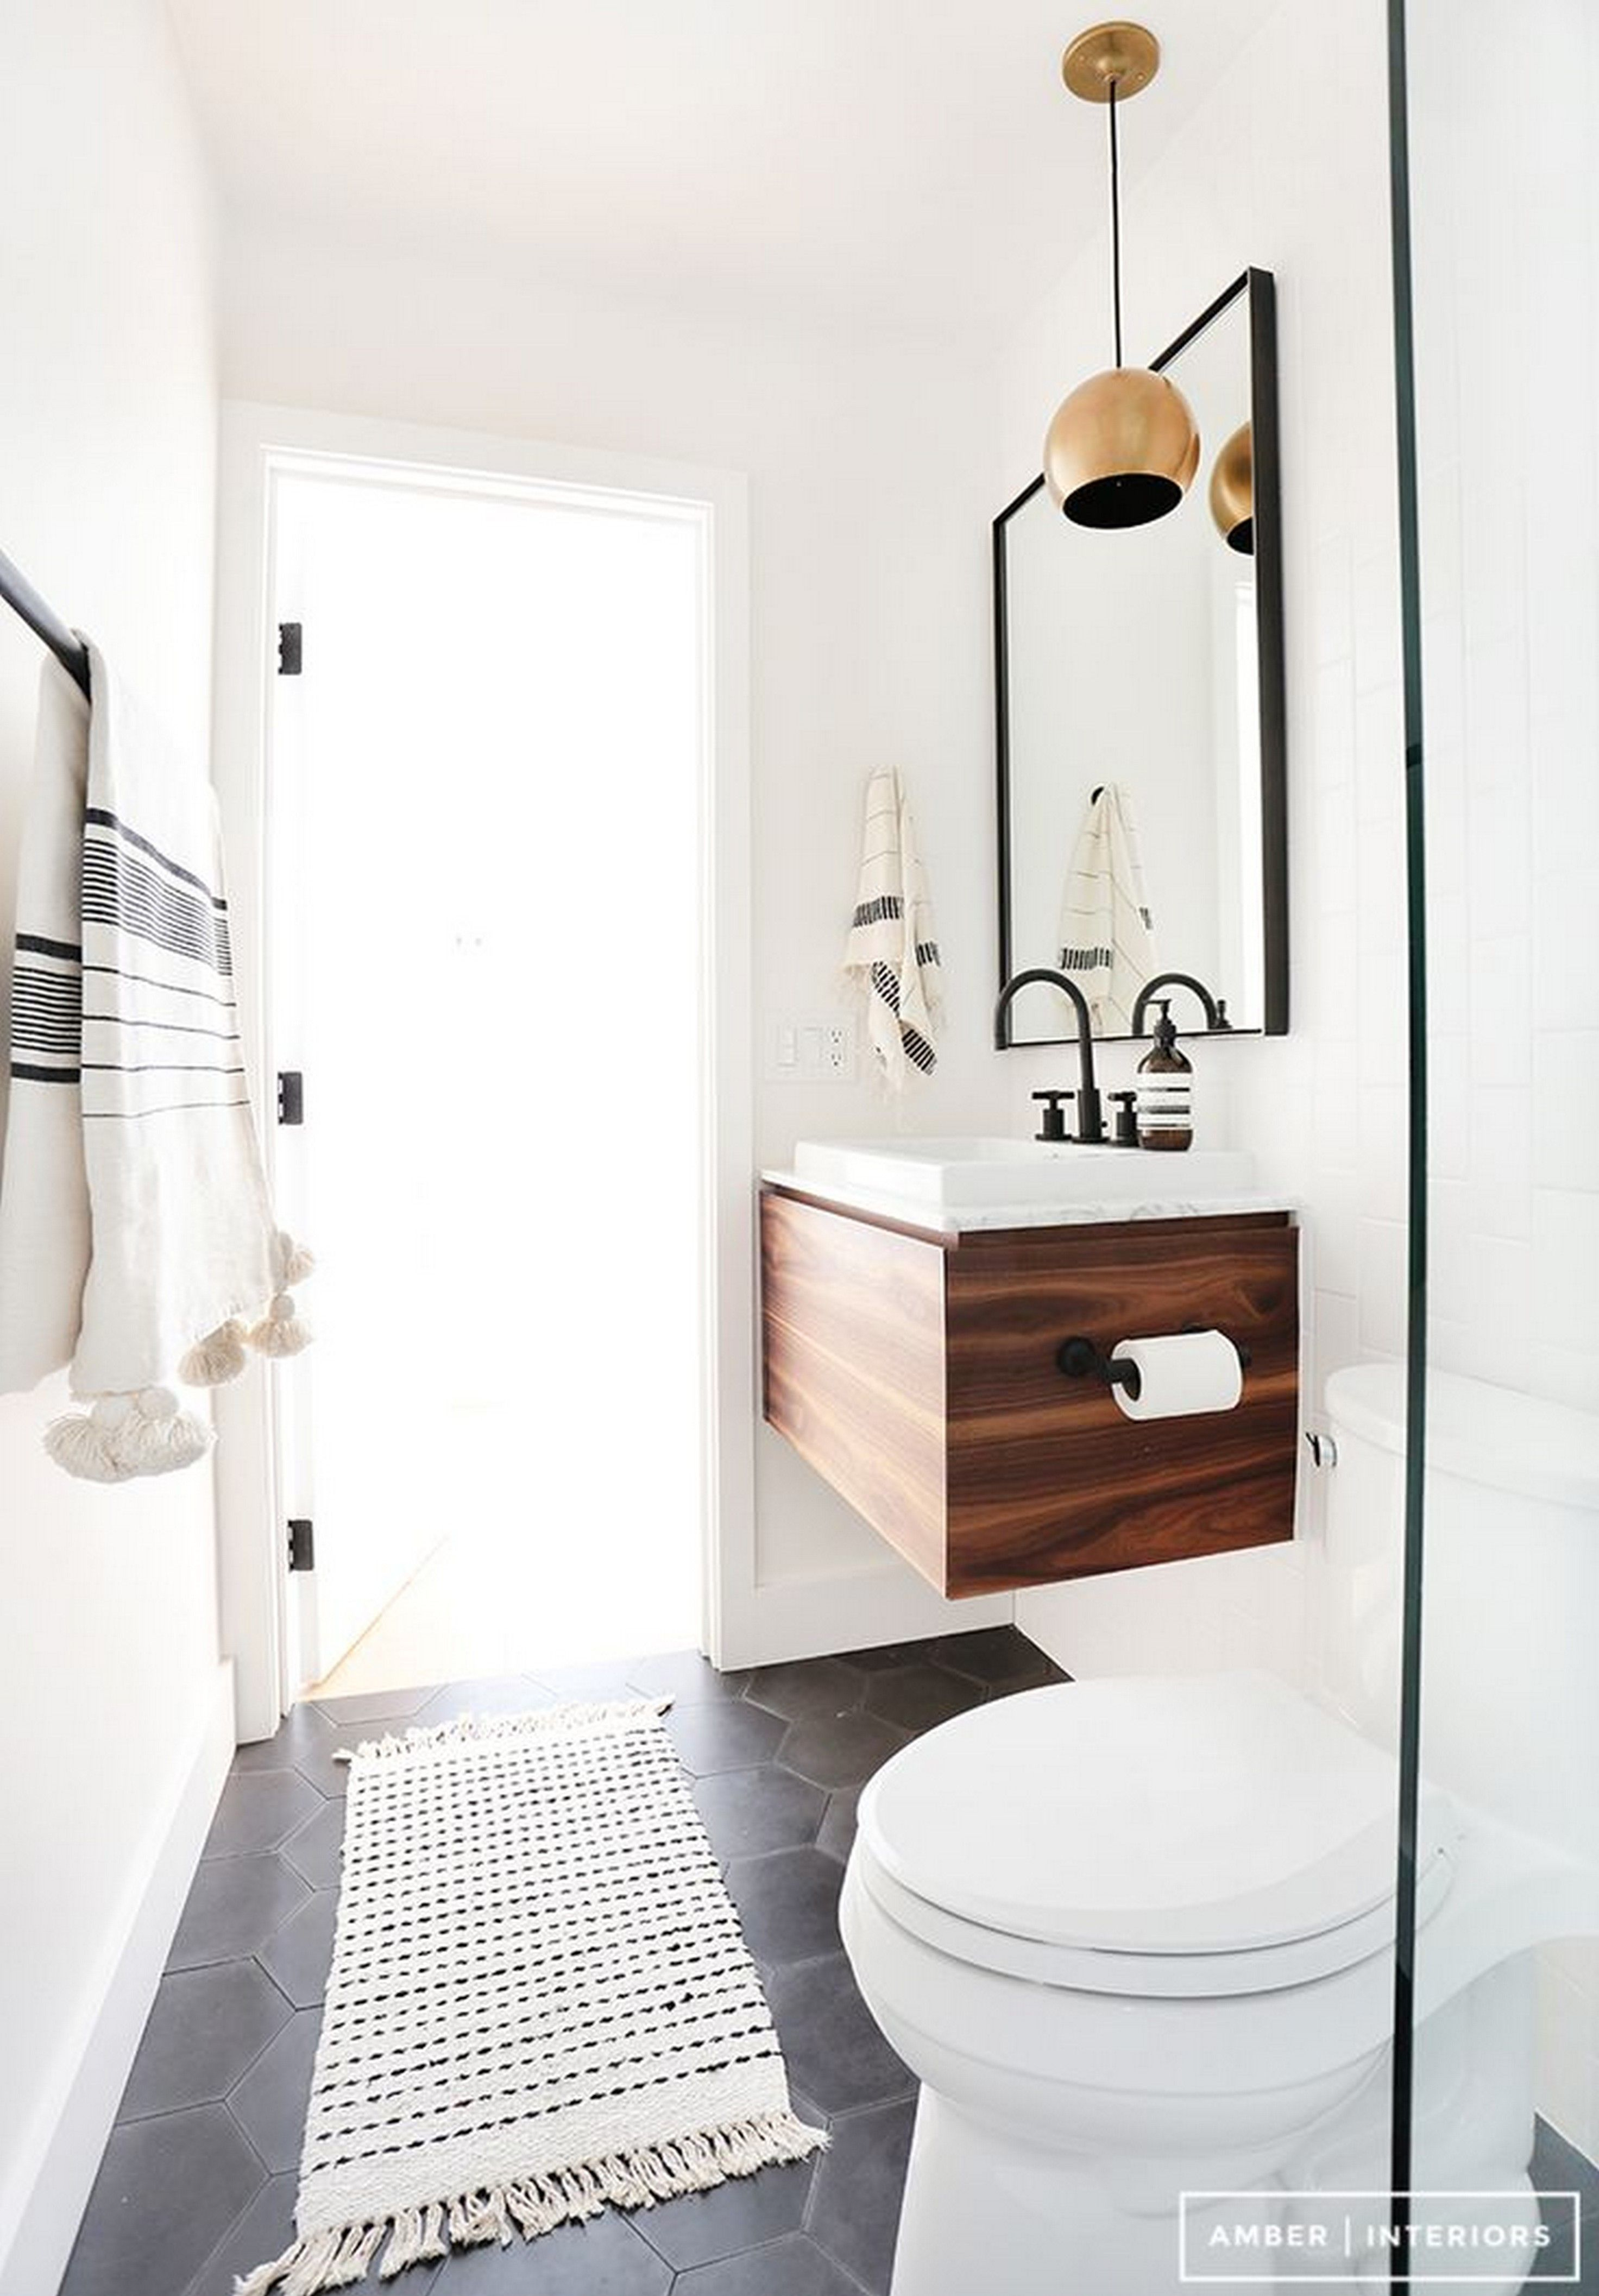 Home Depot Bathroom Vanity Backsplash | Bathroom Ideas | Pinterest ...